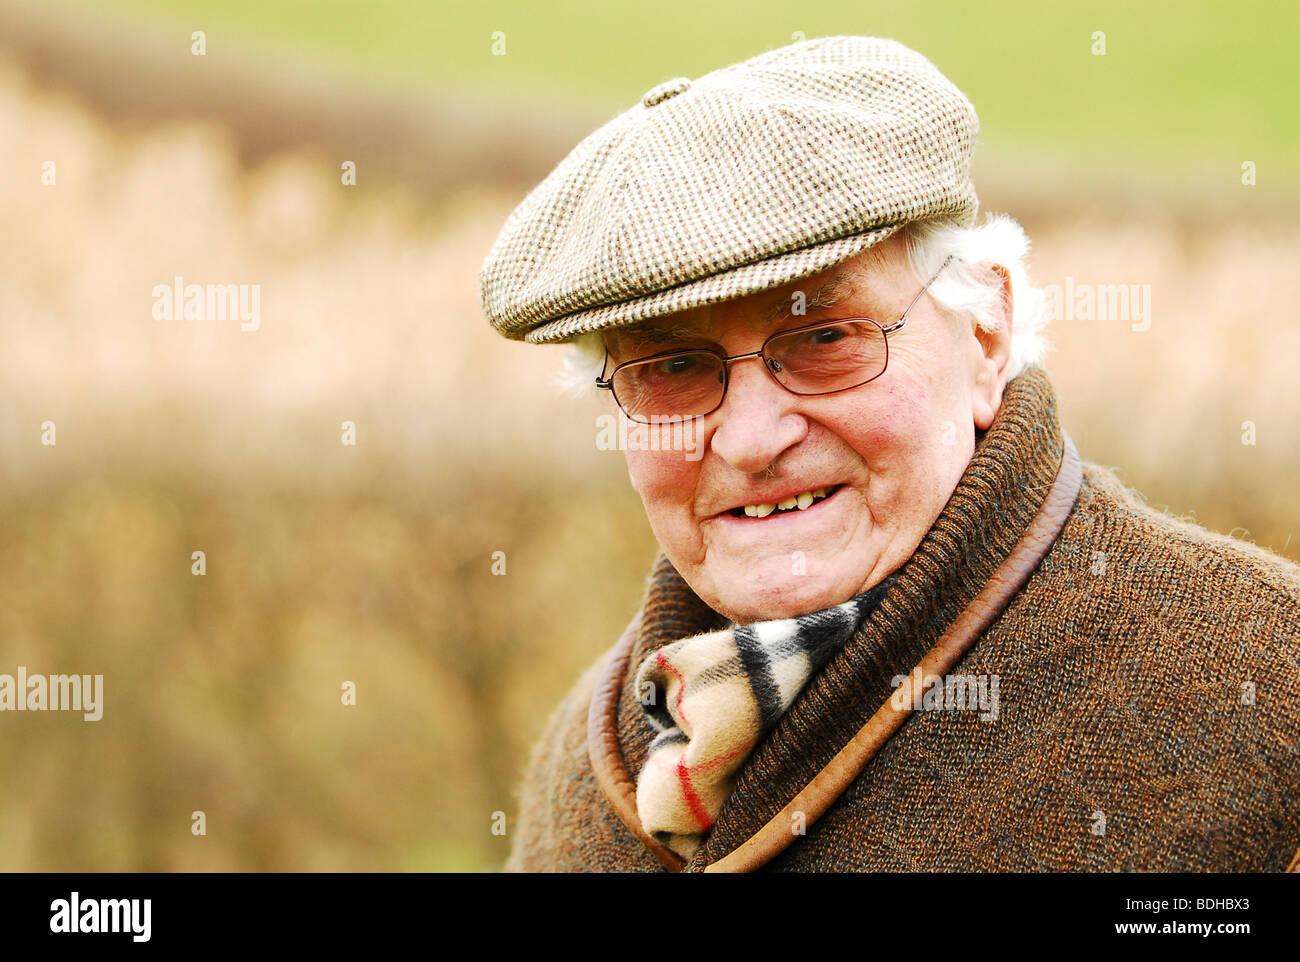 f95573520bde farmer in flat cap Stock Photo: 25583435 - Alamy